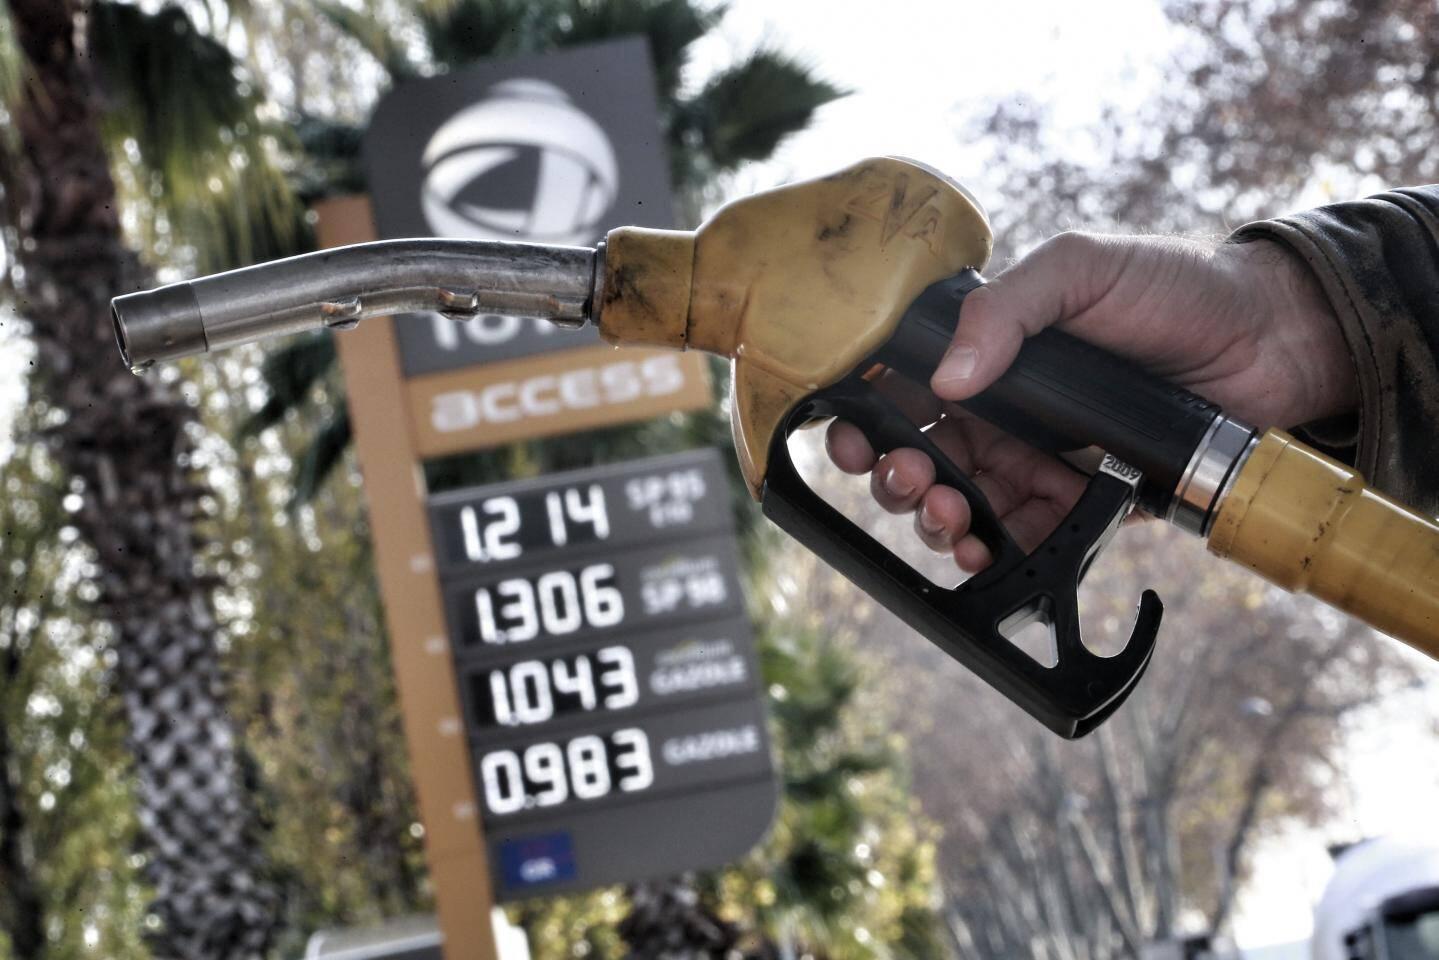 Illustration prix du carburant.